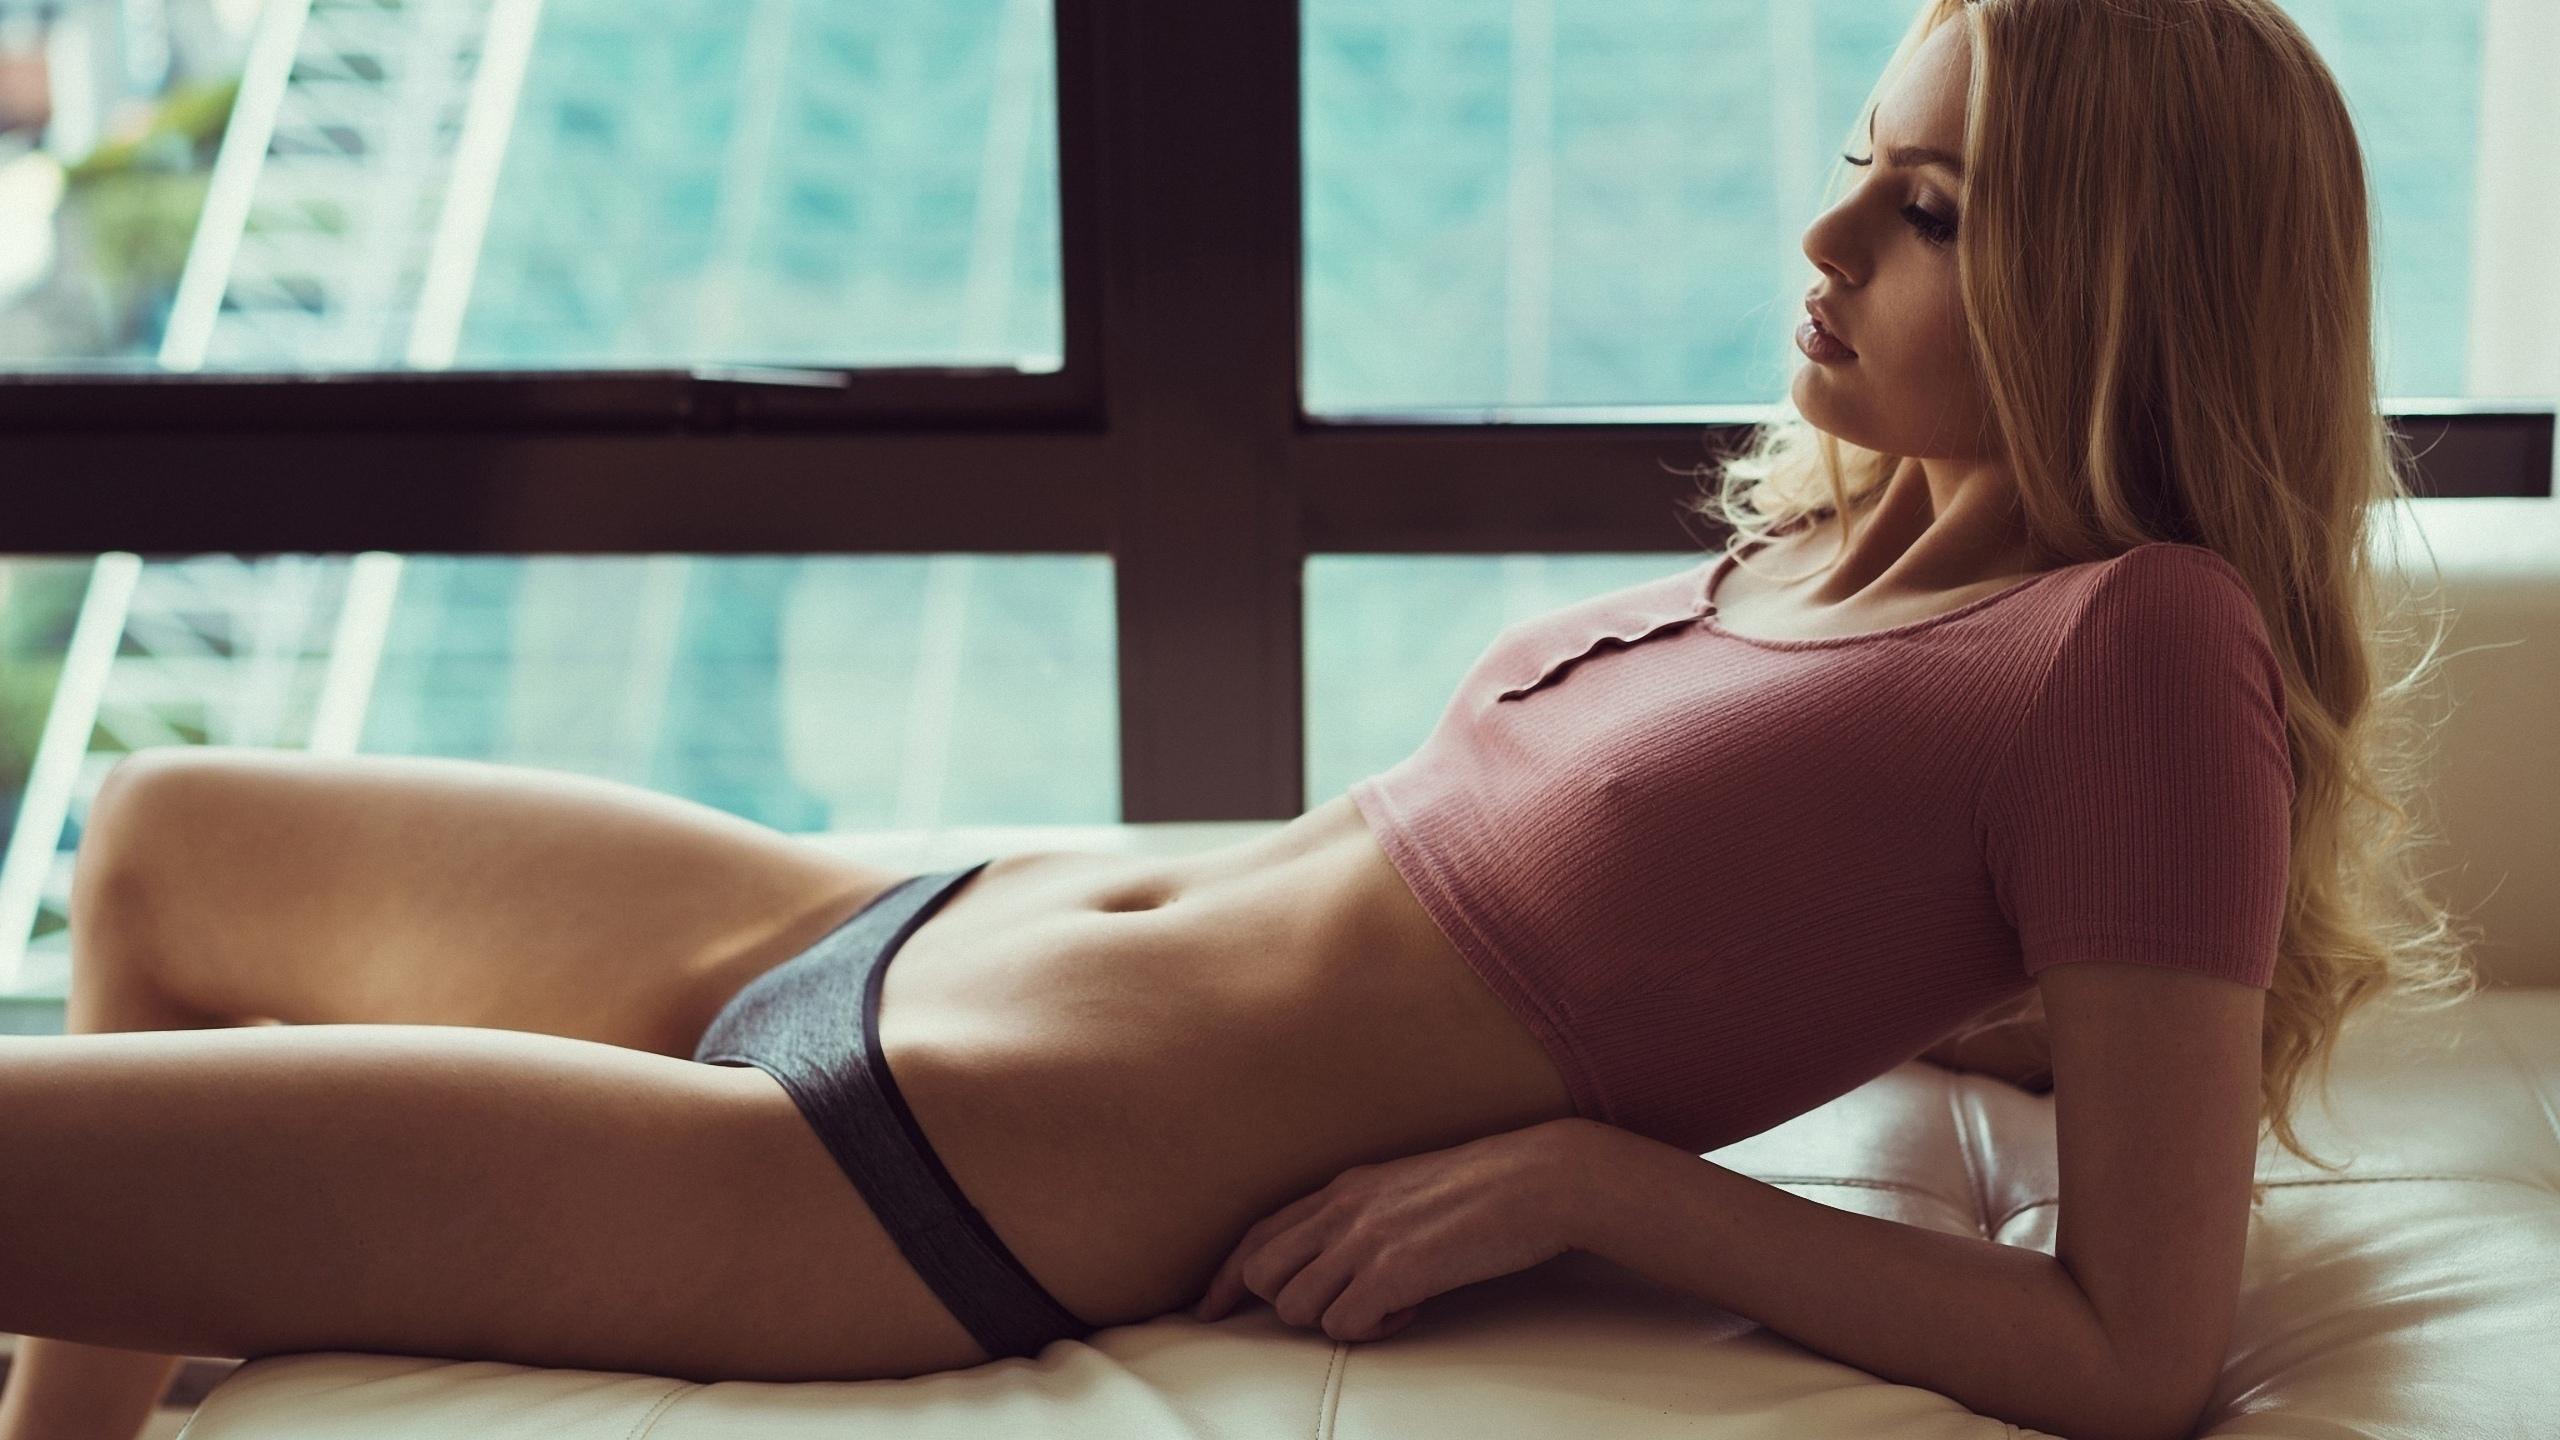 Голая Красота Онлайн